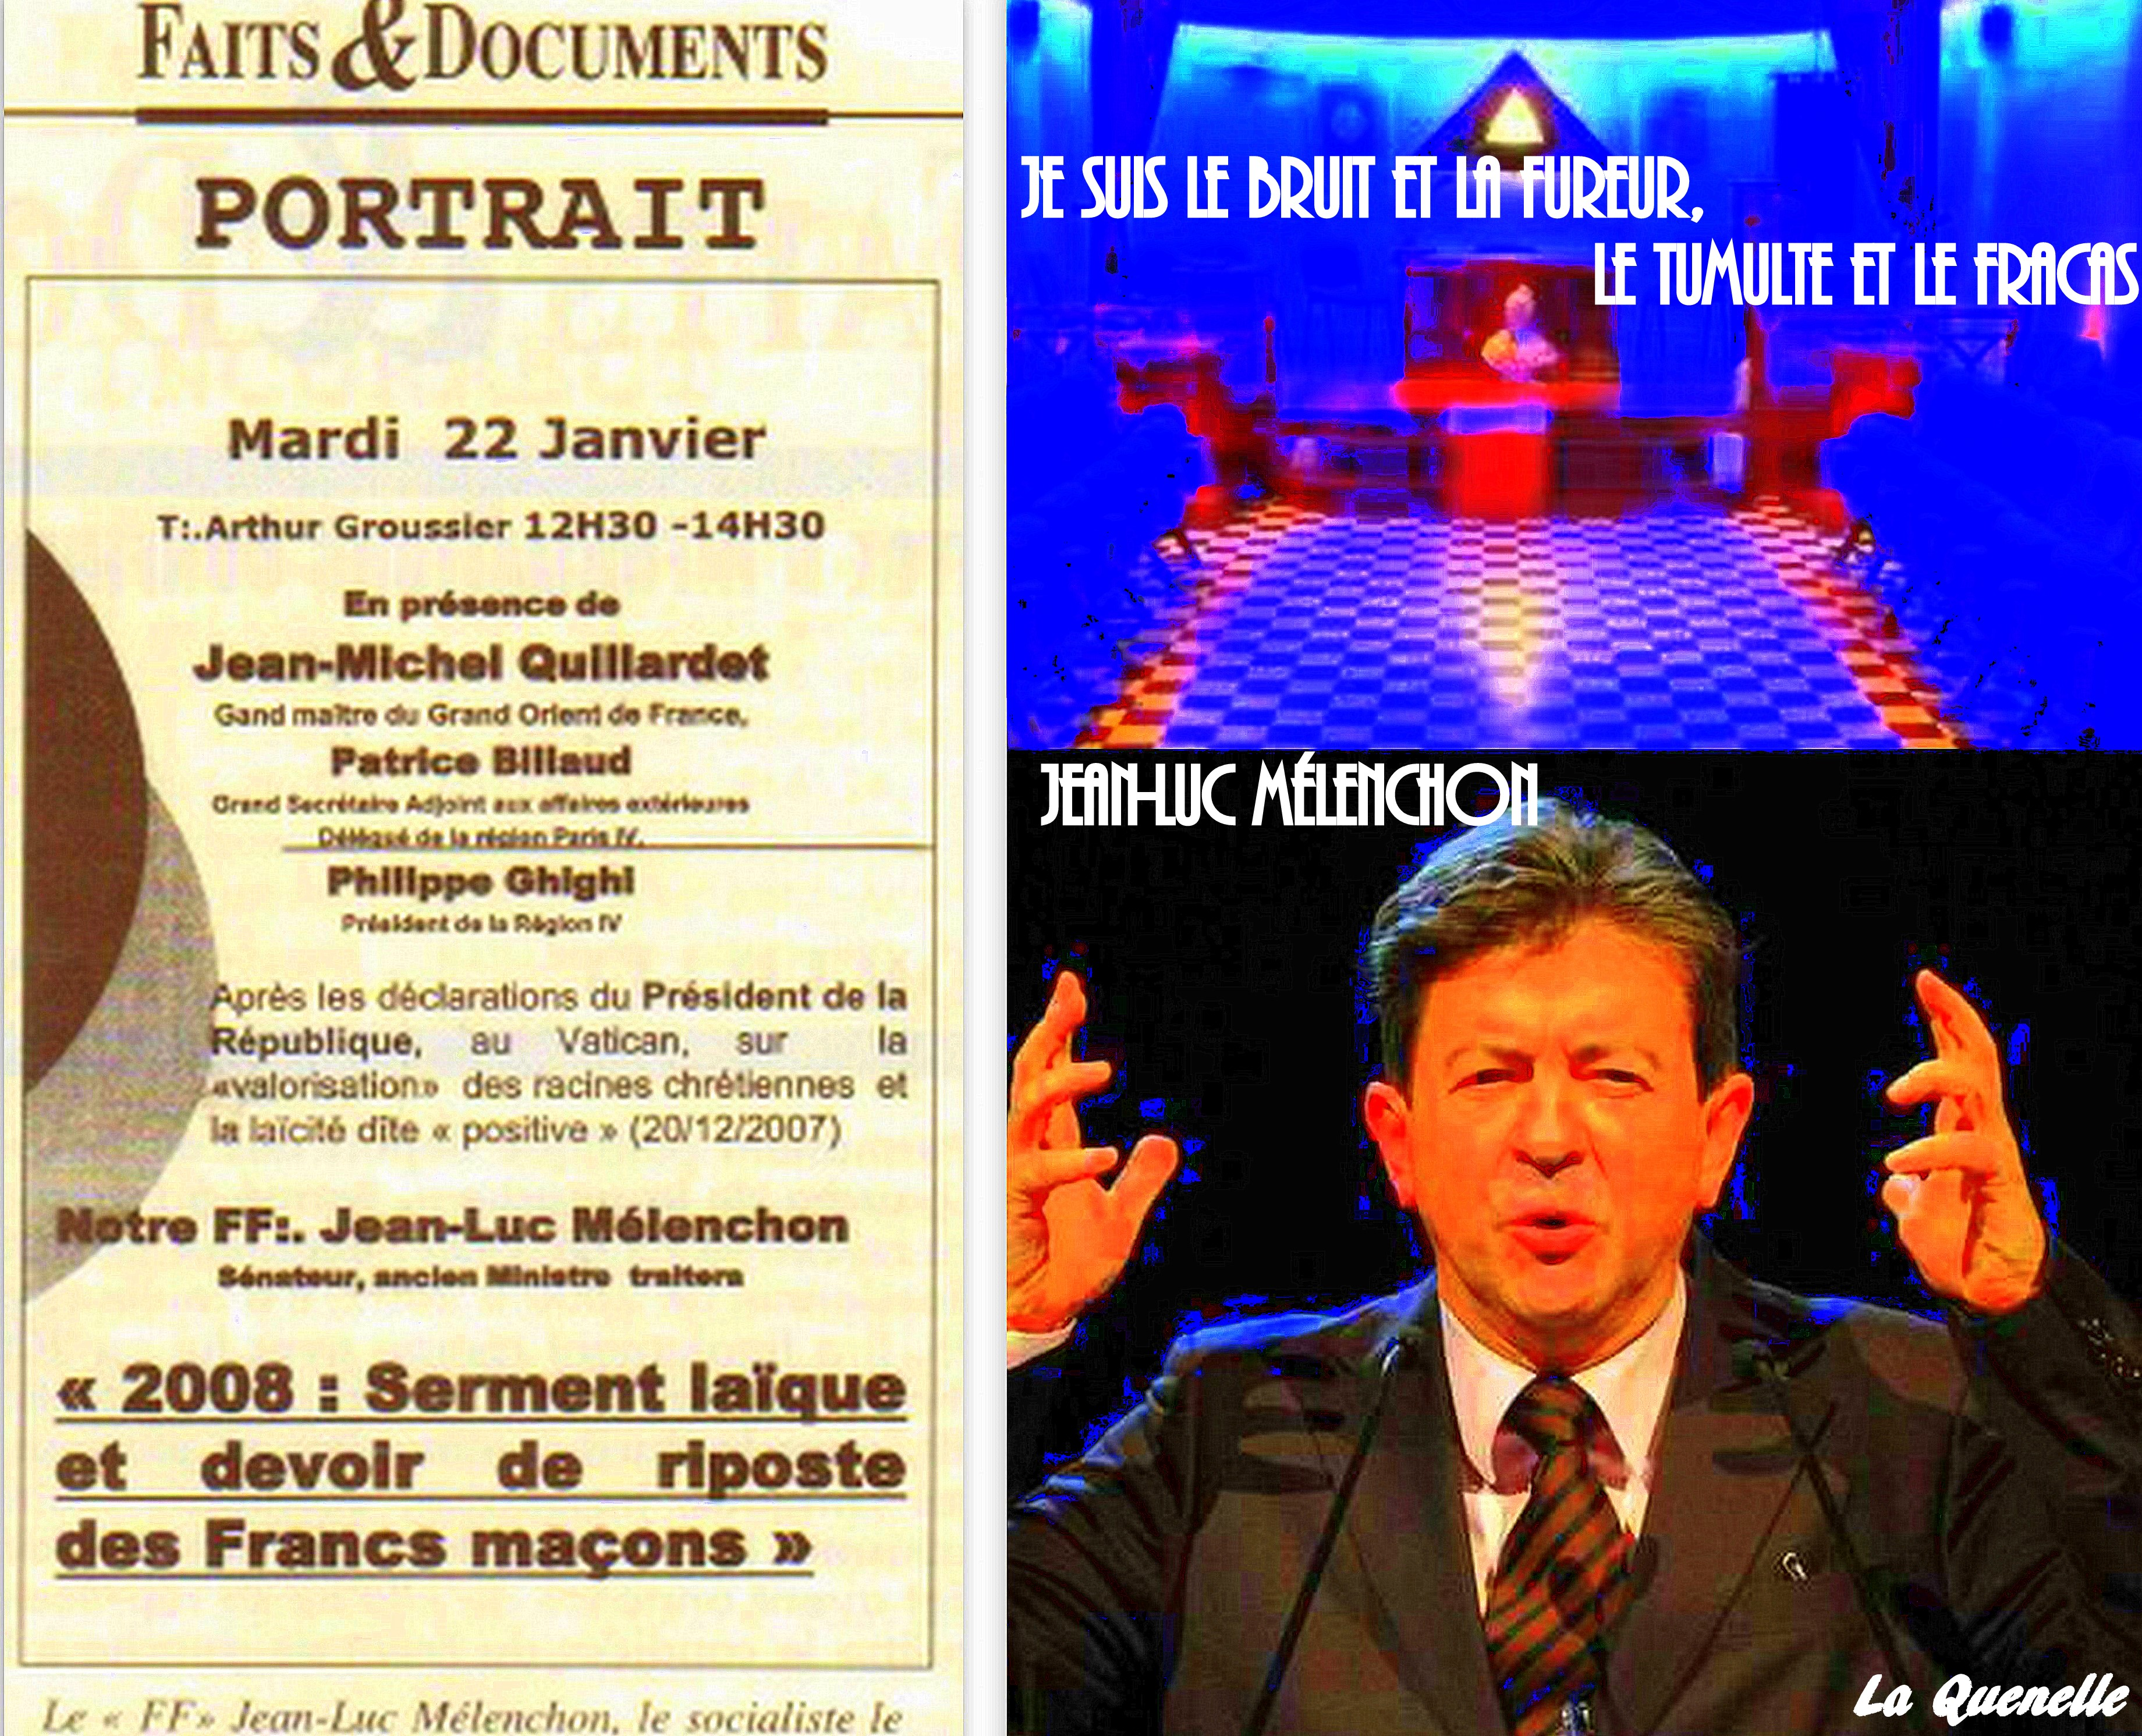 http://pensetouseul.unblog.fr/2010/11/25/files/2010/11/rcemmentmisjour2.jpg